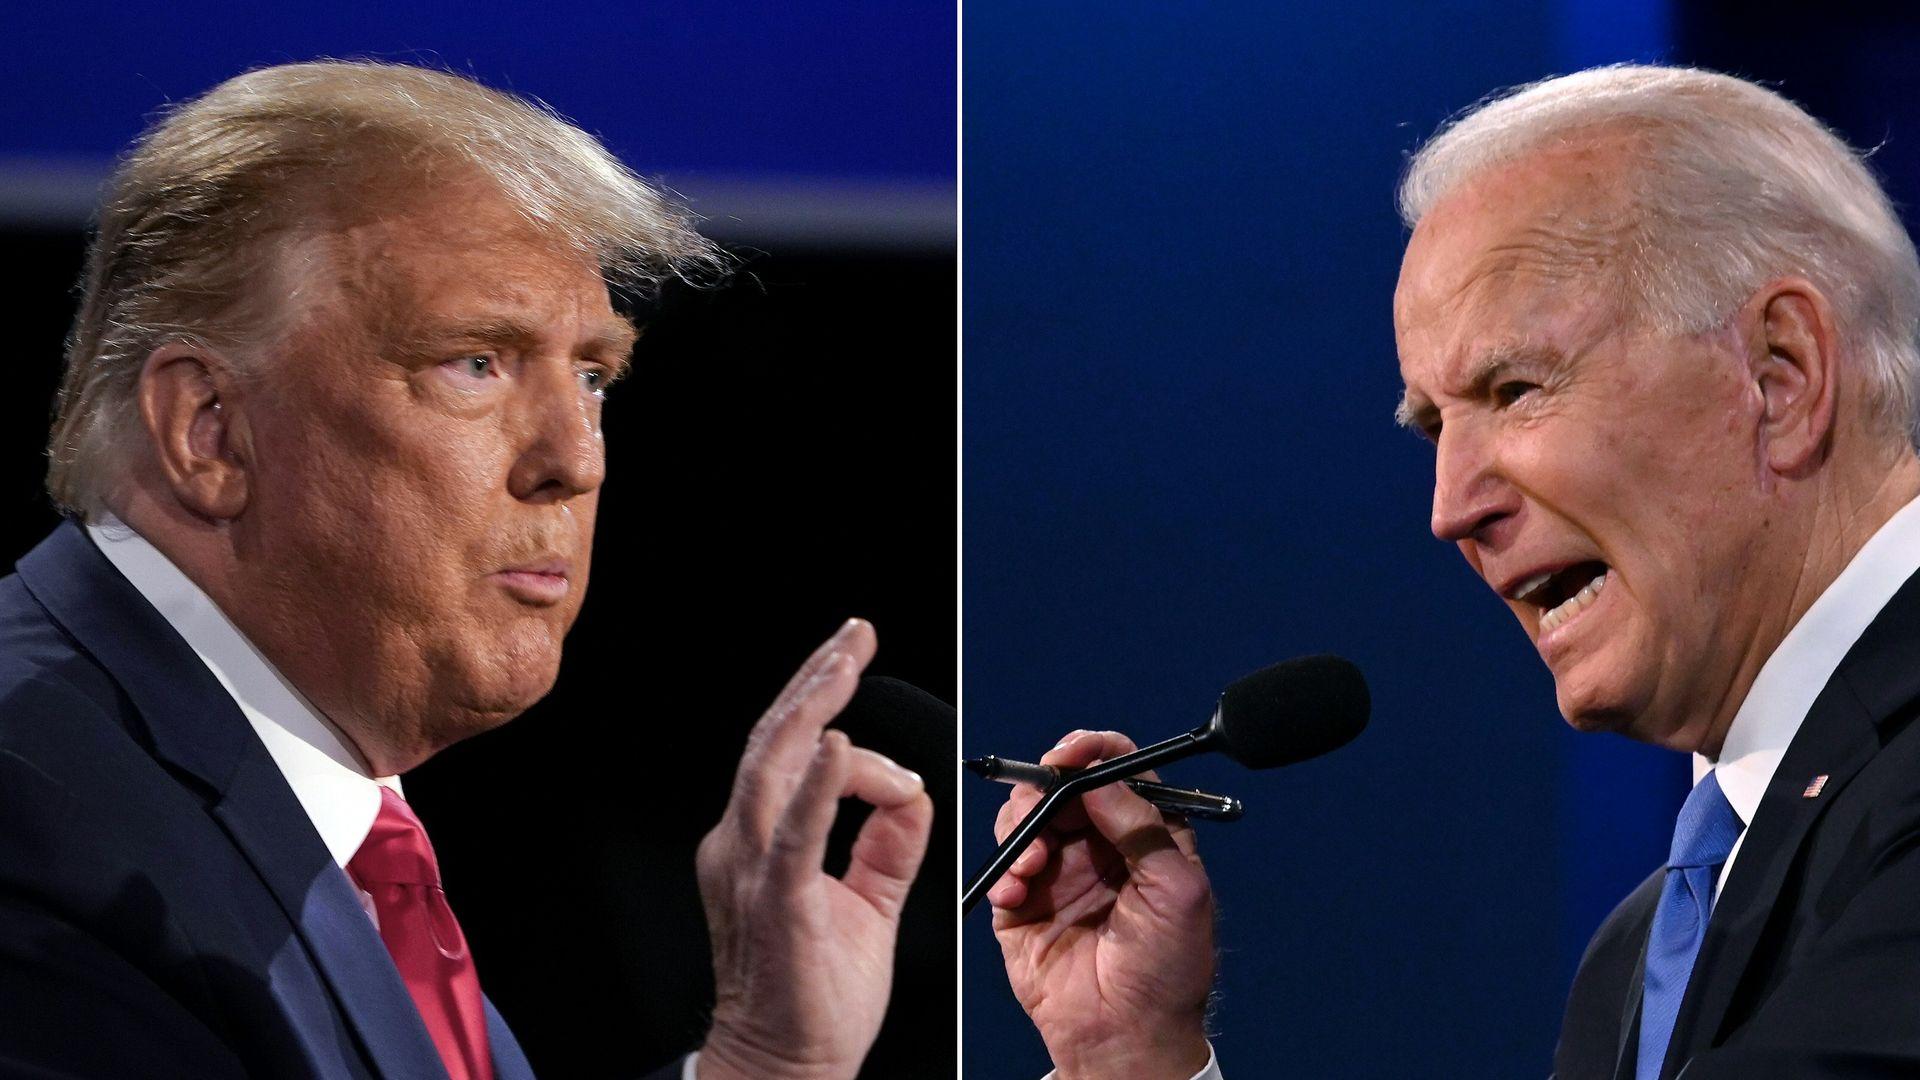 US President Donald Trump (L) and former US Vice President Joe Biden during a debate - Credit: BRENDAN SMIALOWSKI, JIM WATSON/AFP via Getty Images